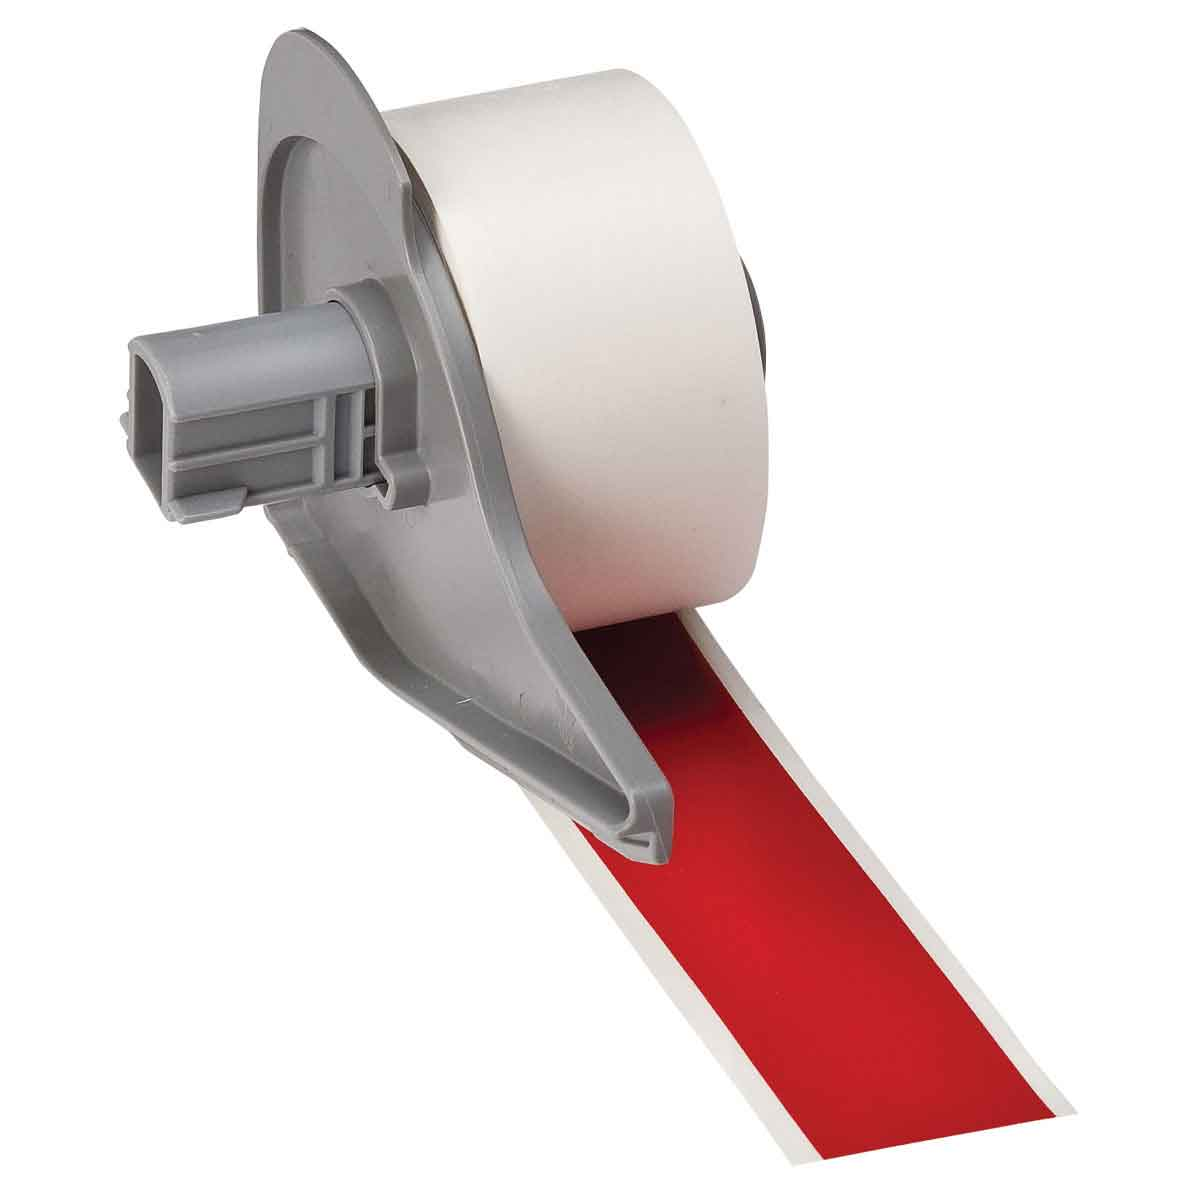 Brady® M71C-1000-595-RD Blank Thermal Transfer Tape, 50 ft L x 1 in W, Red, B-595 Vinyl, Permanent Acrylic Adhesive, -40 to 180 deg F